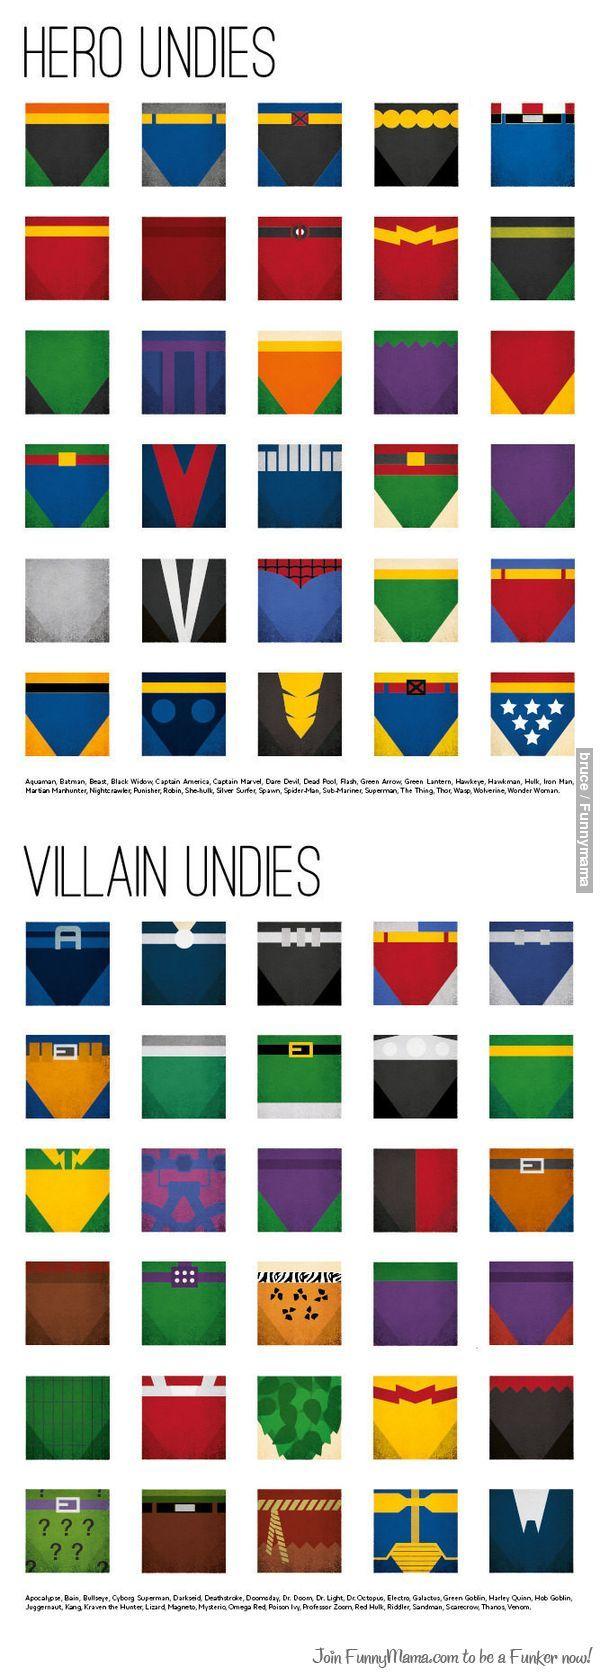 Hero And Villain Undies